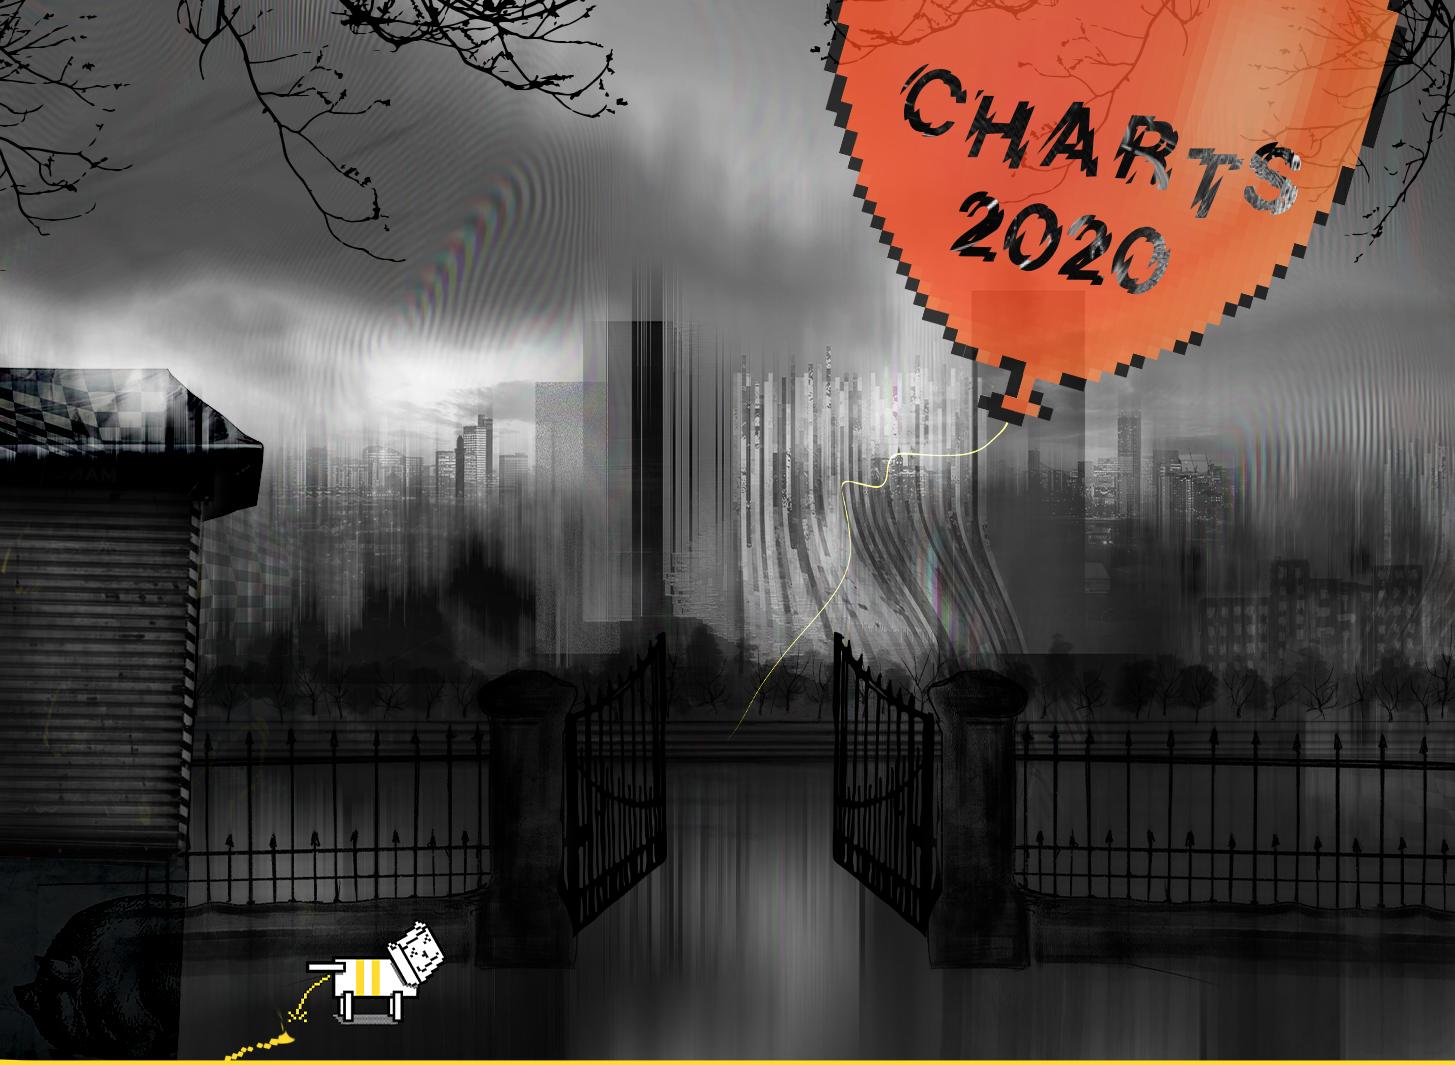 000 chart main page update 12